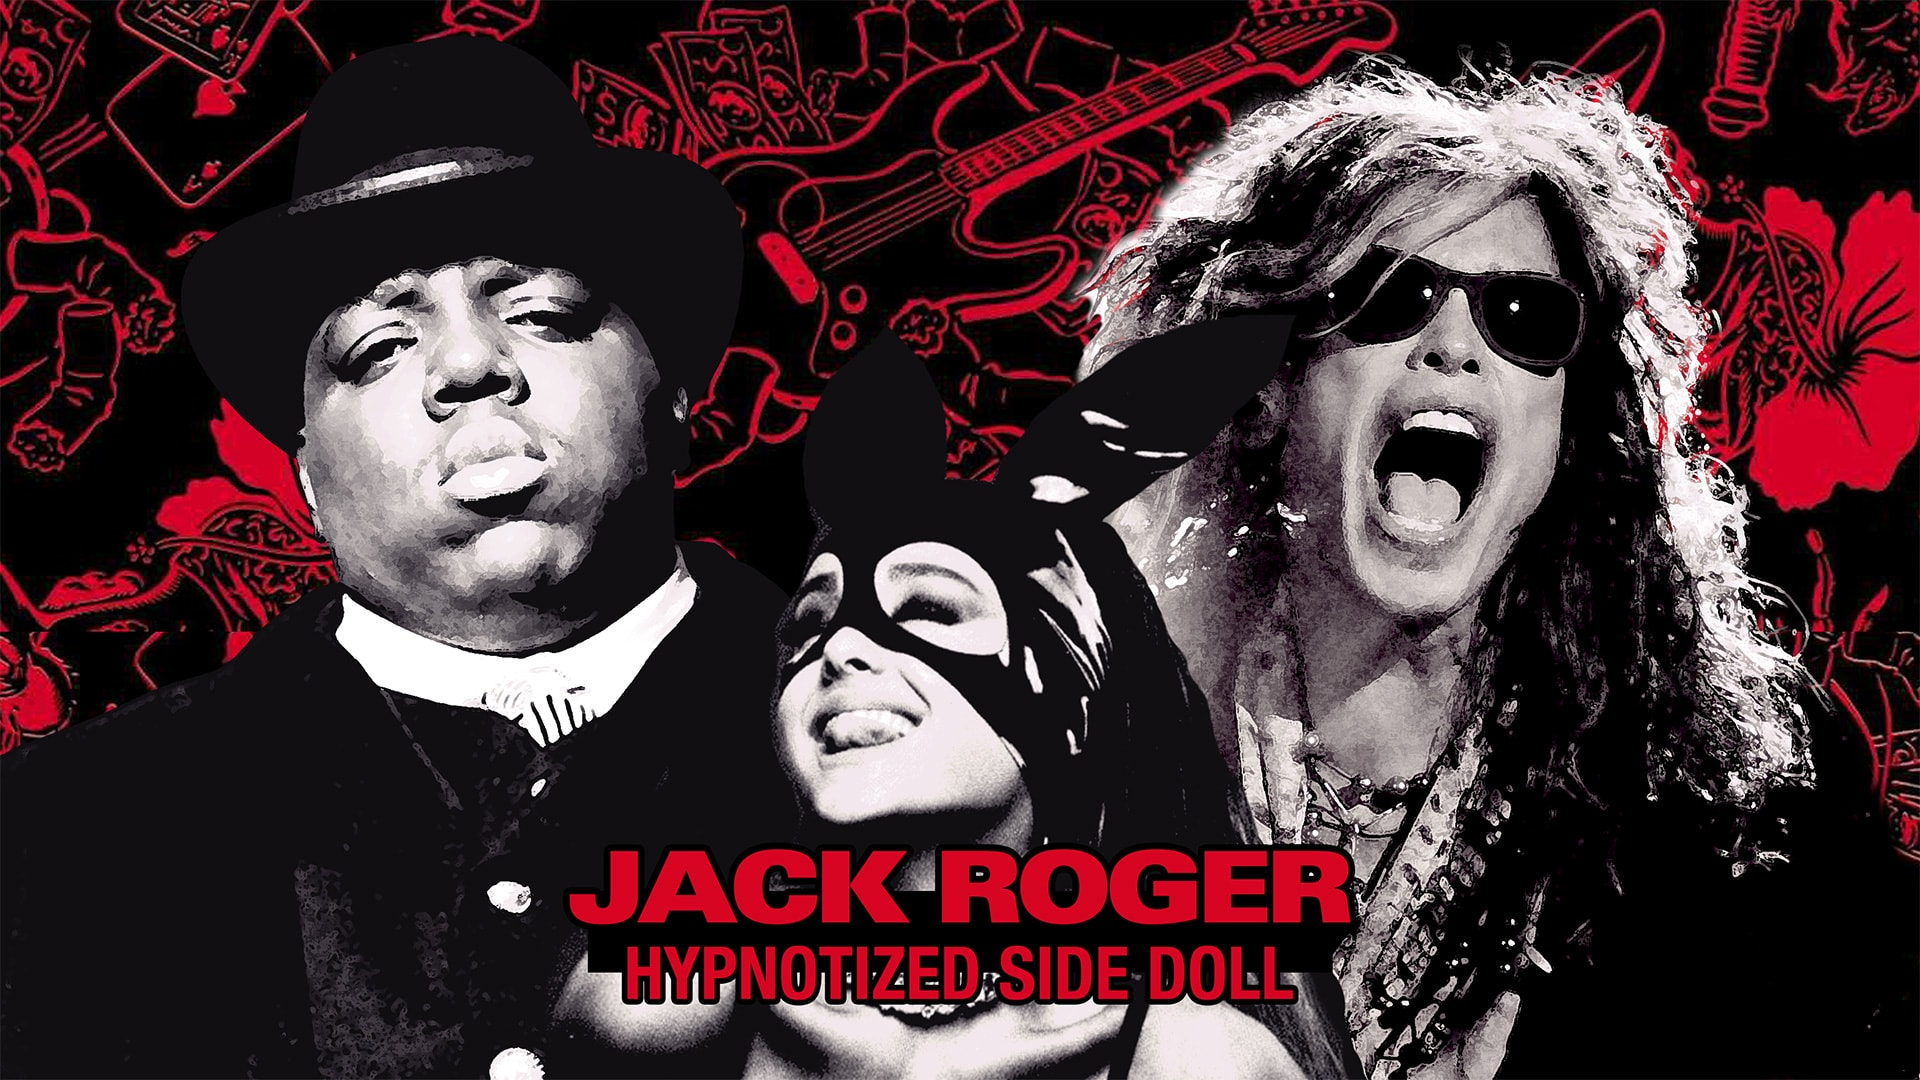 06-Hypnotized-Side-Doll-widescreen